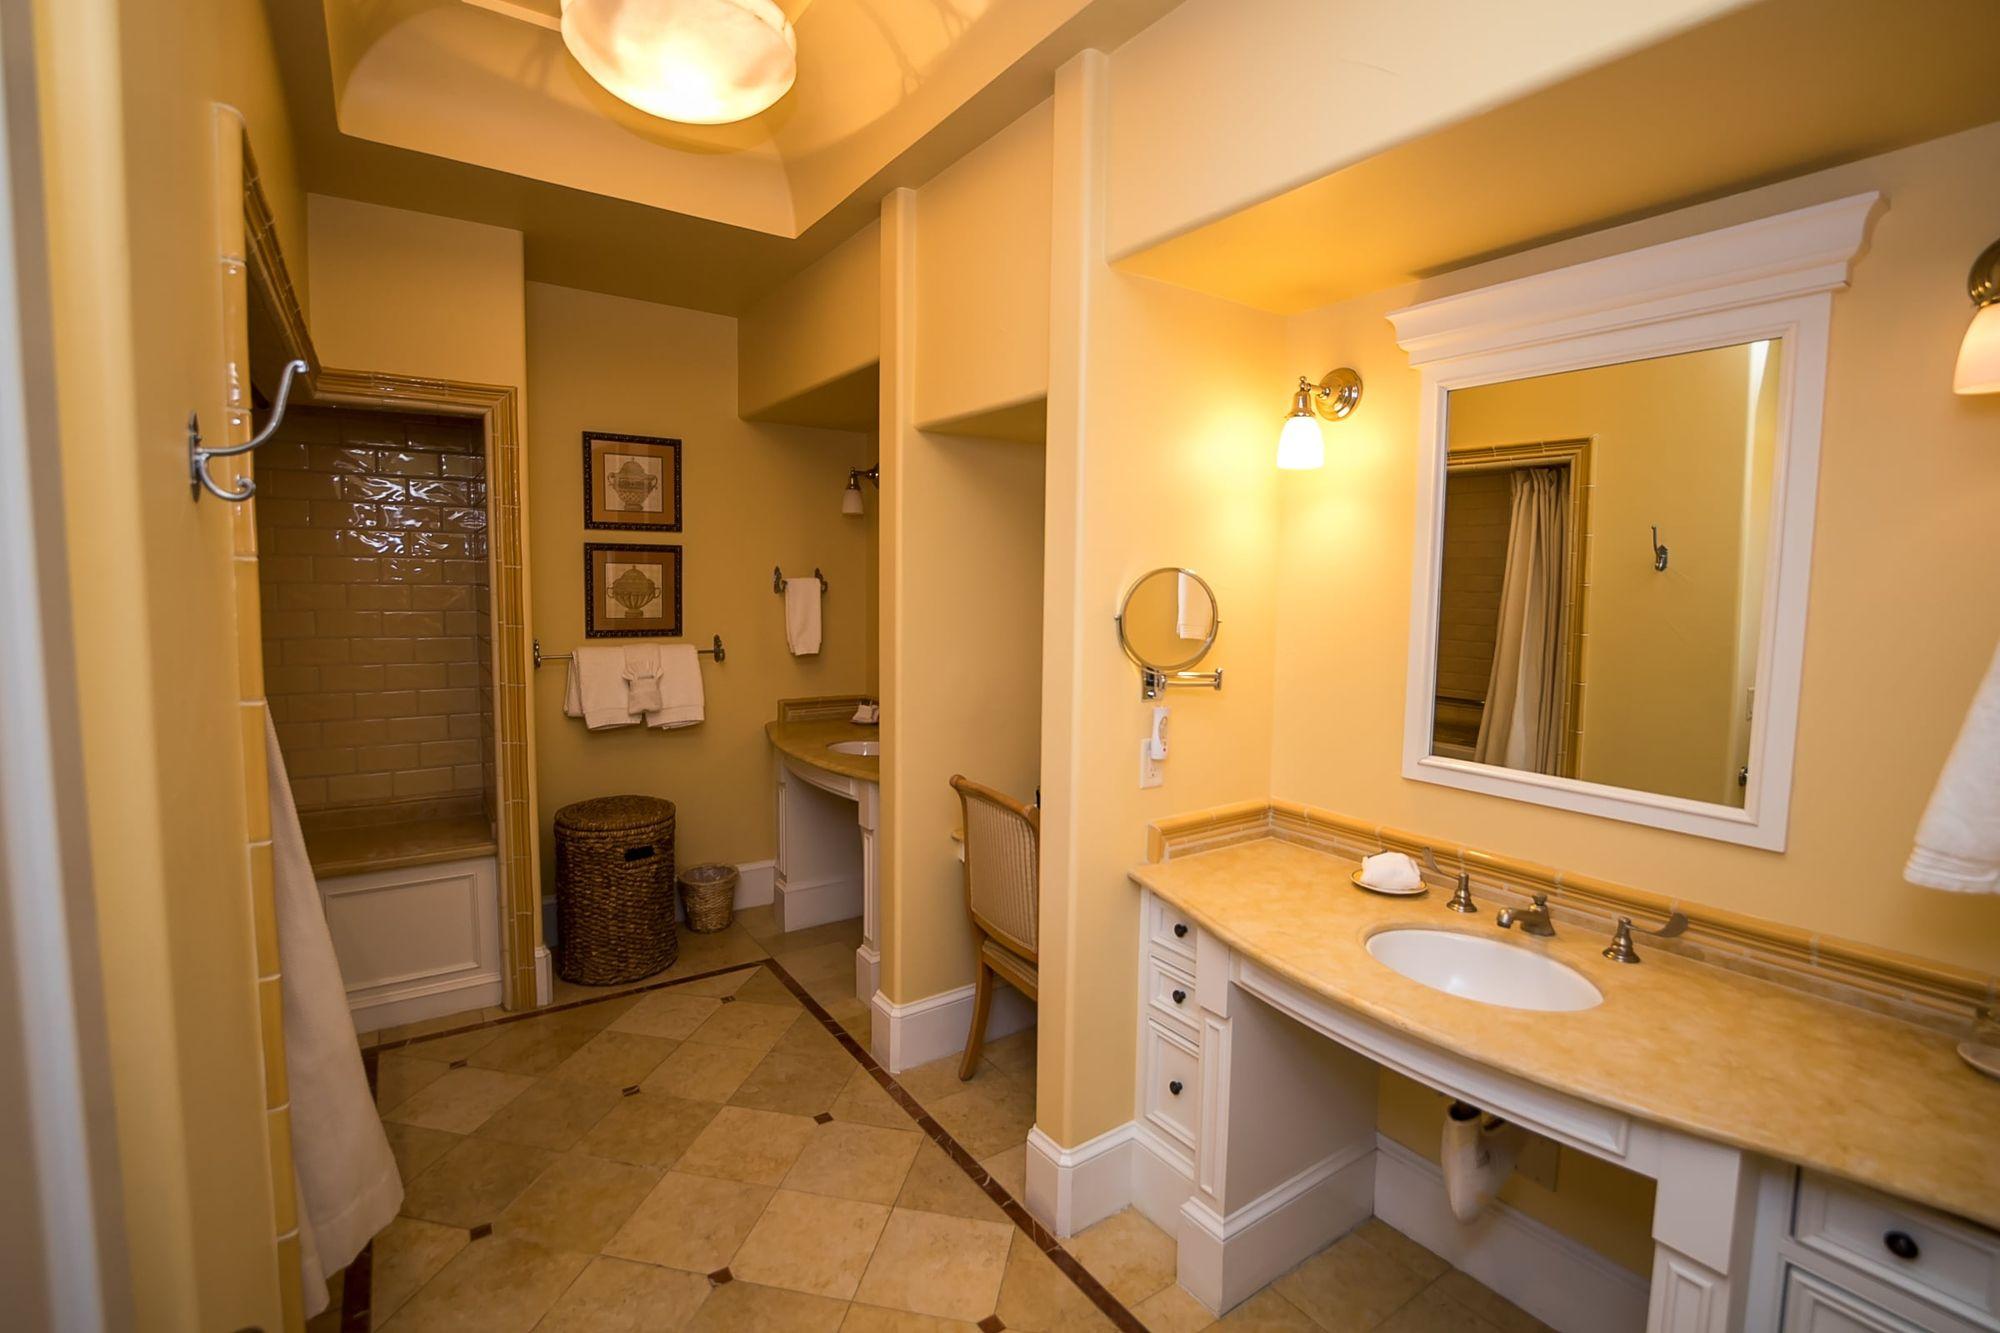 Bathroom with two vanities and tile floors